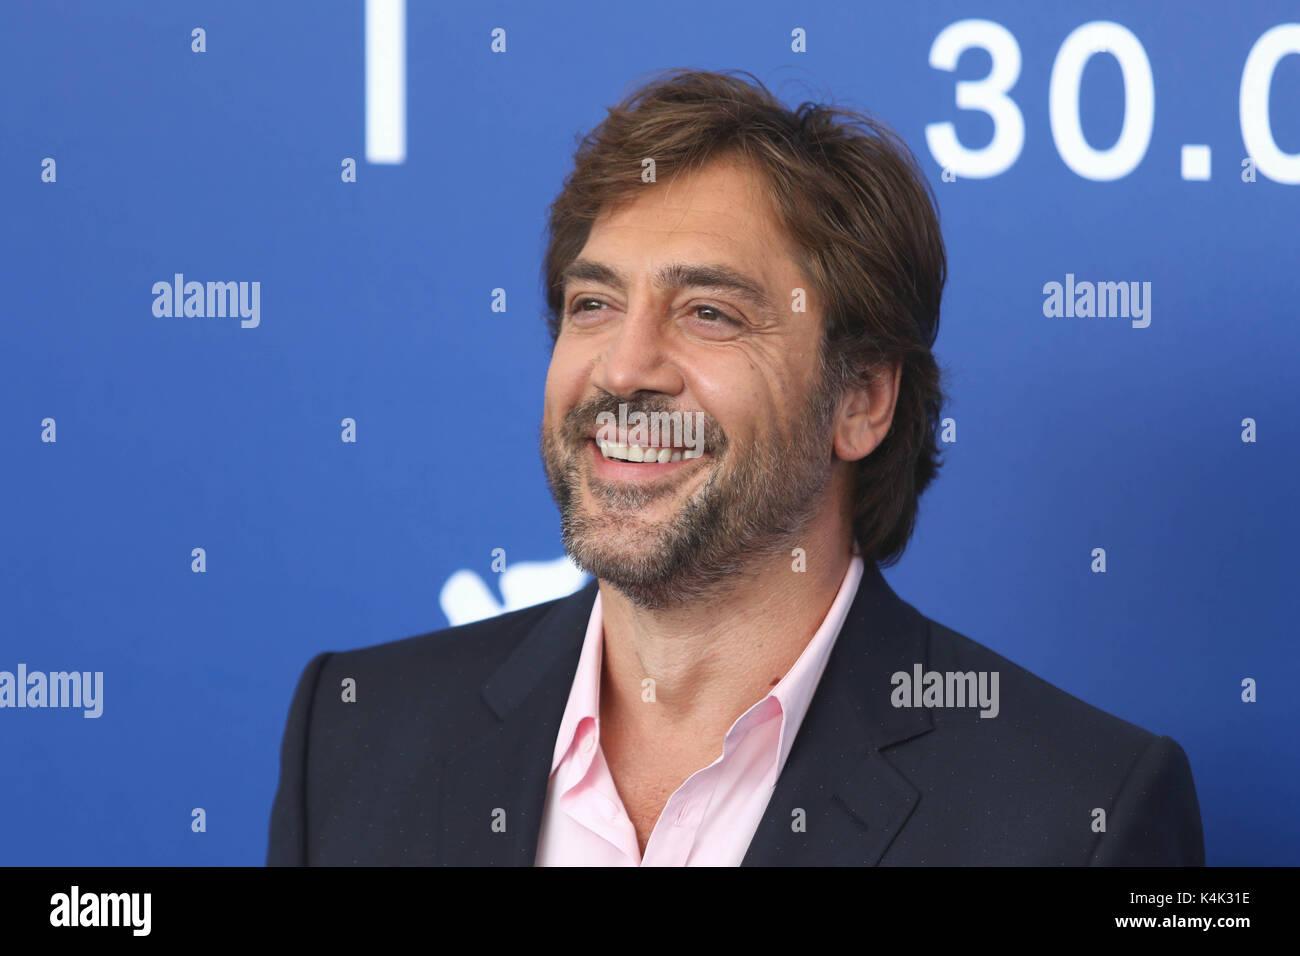 Lido Di Venezia, Italy. 06th Sep, 2017. Europe, Italy, Lido di Venezia, 06 september, 2017 : Javier Bardem, at the - Stock Image